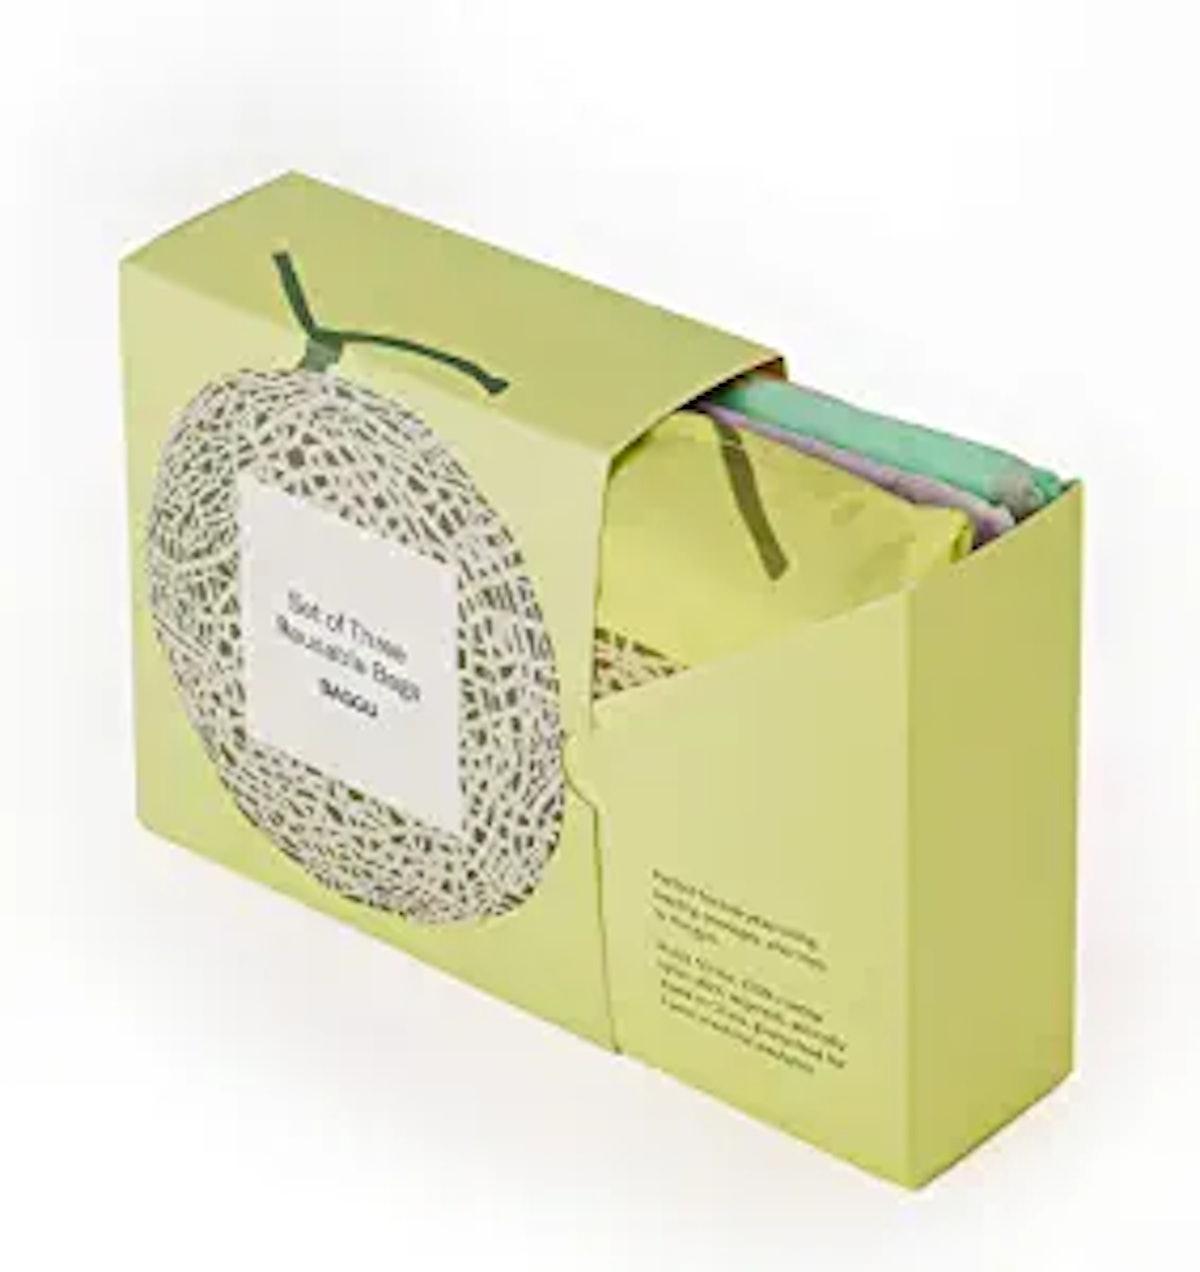 BAGGU Reusable Shopping Bag (3-Pack)